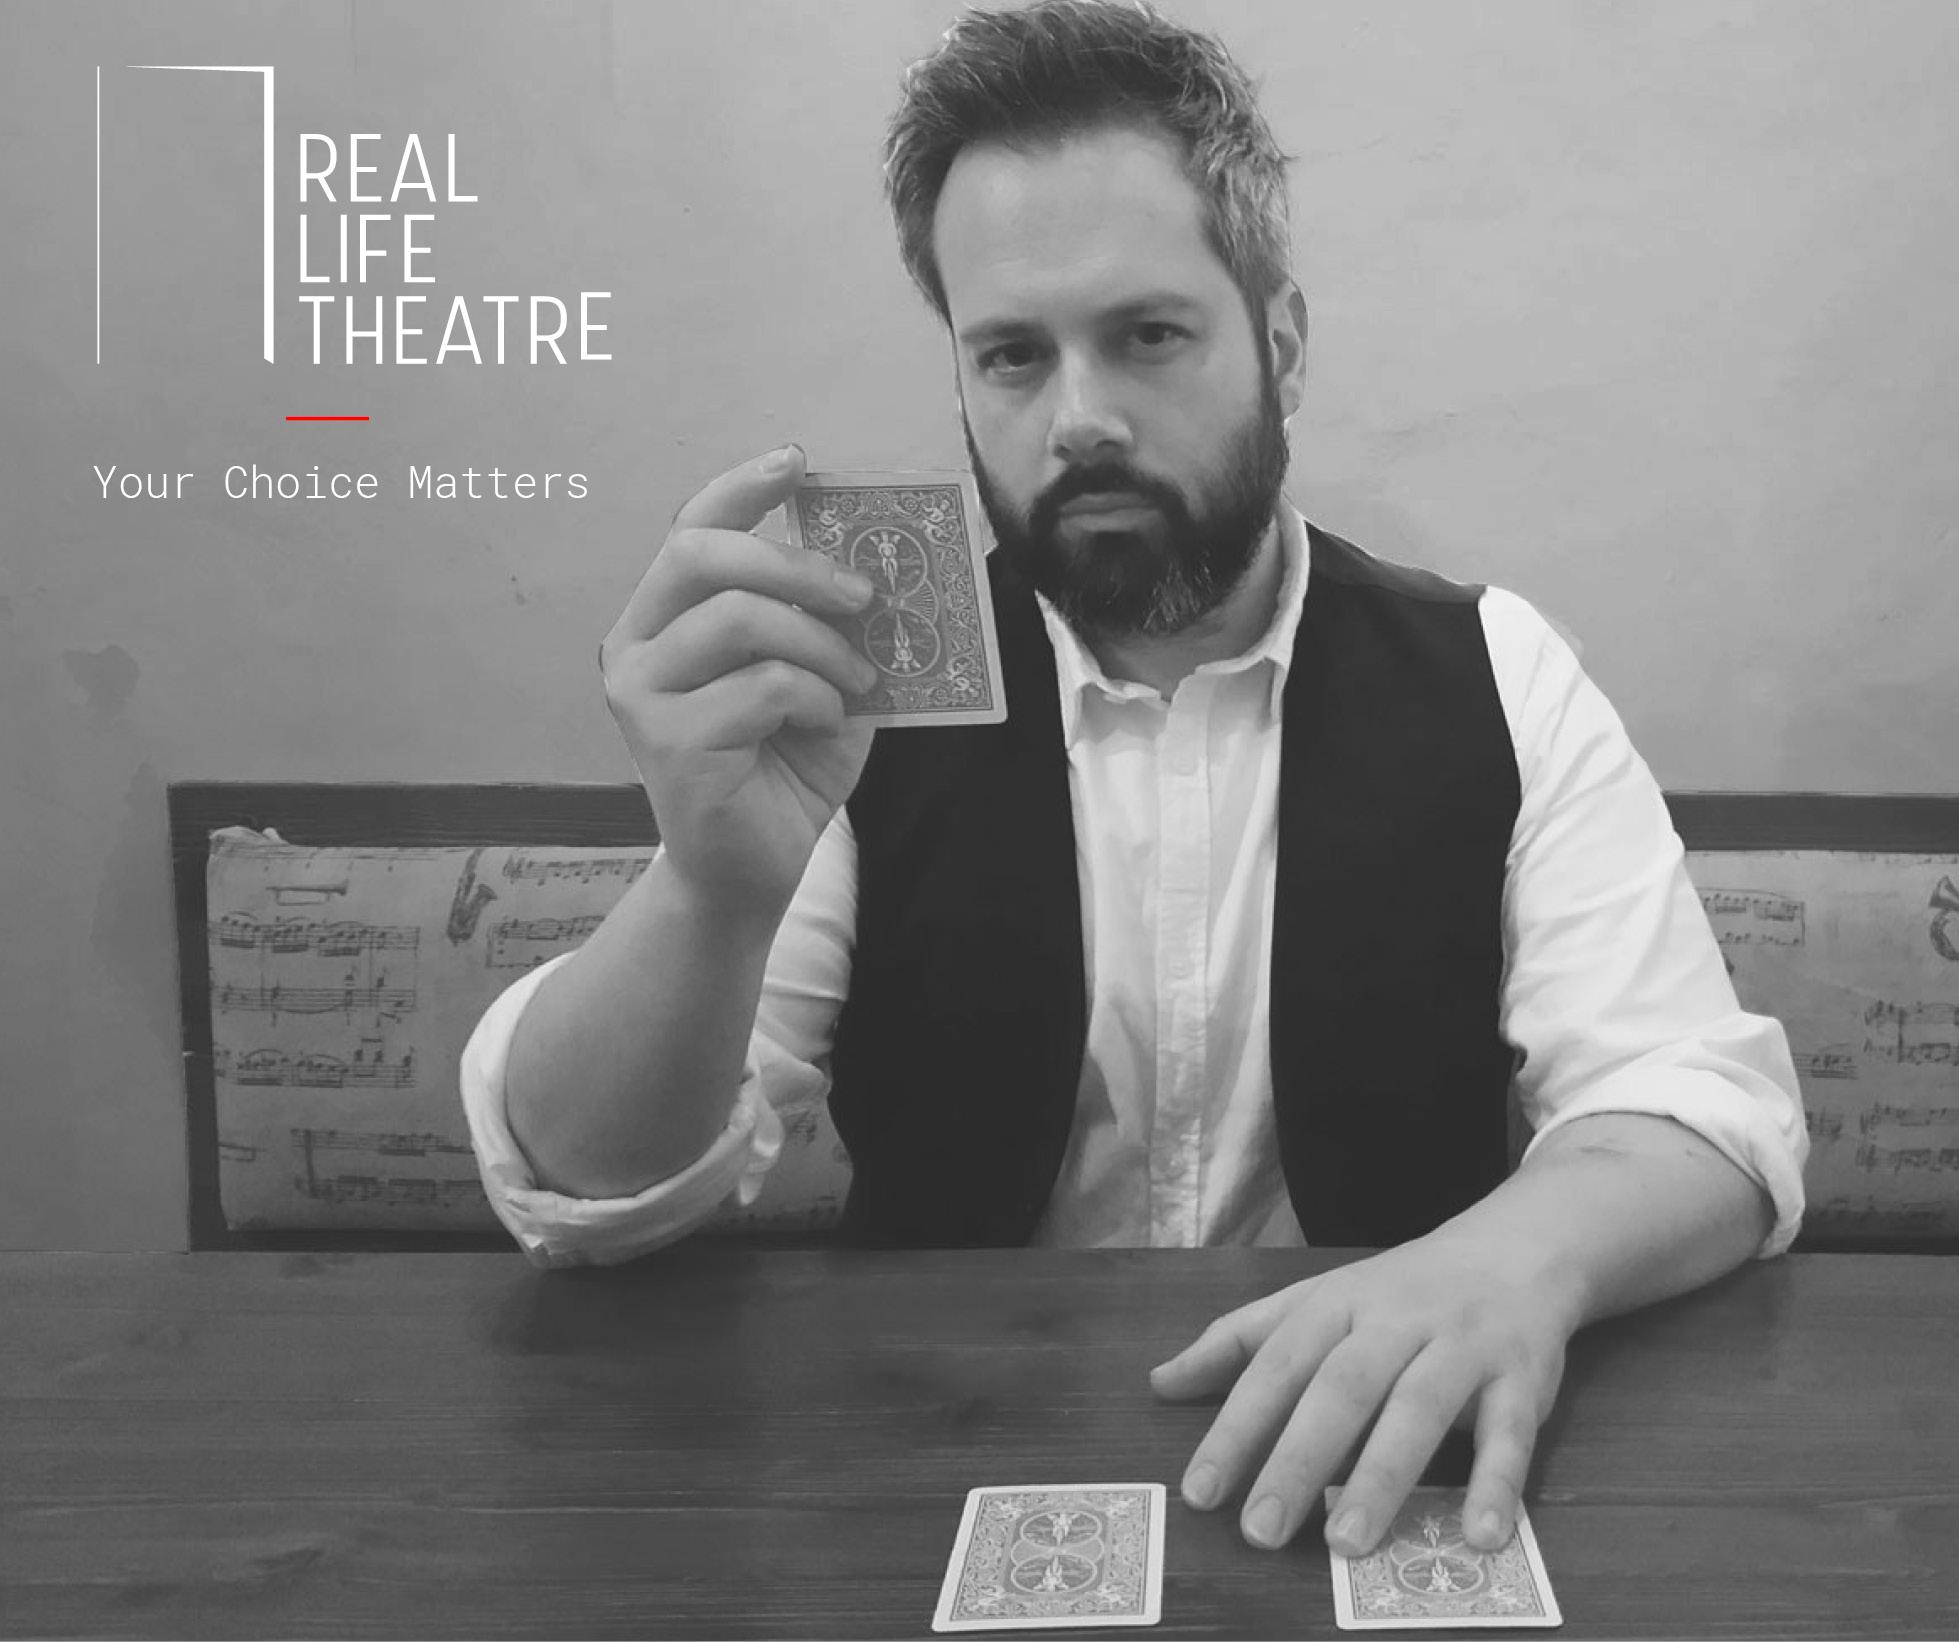 Teatro Verona-real-life-theatre